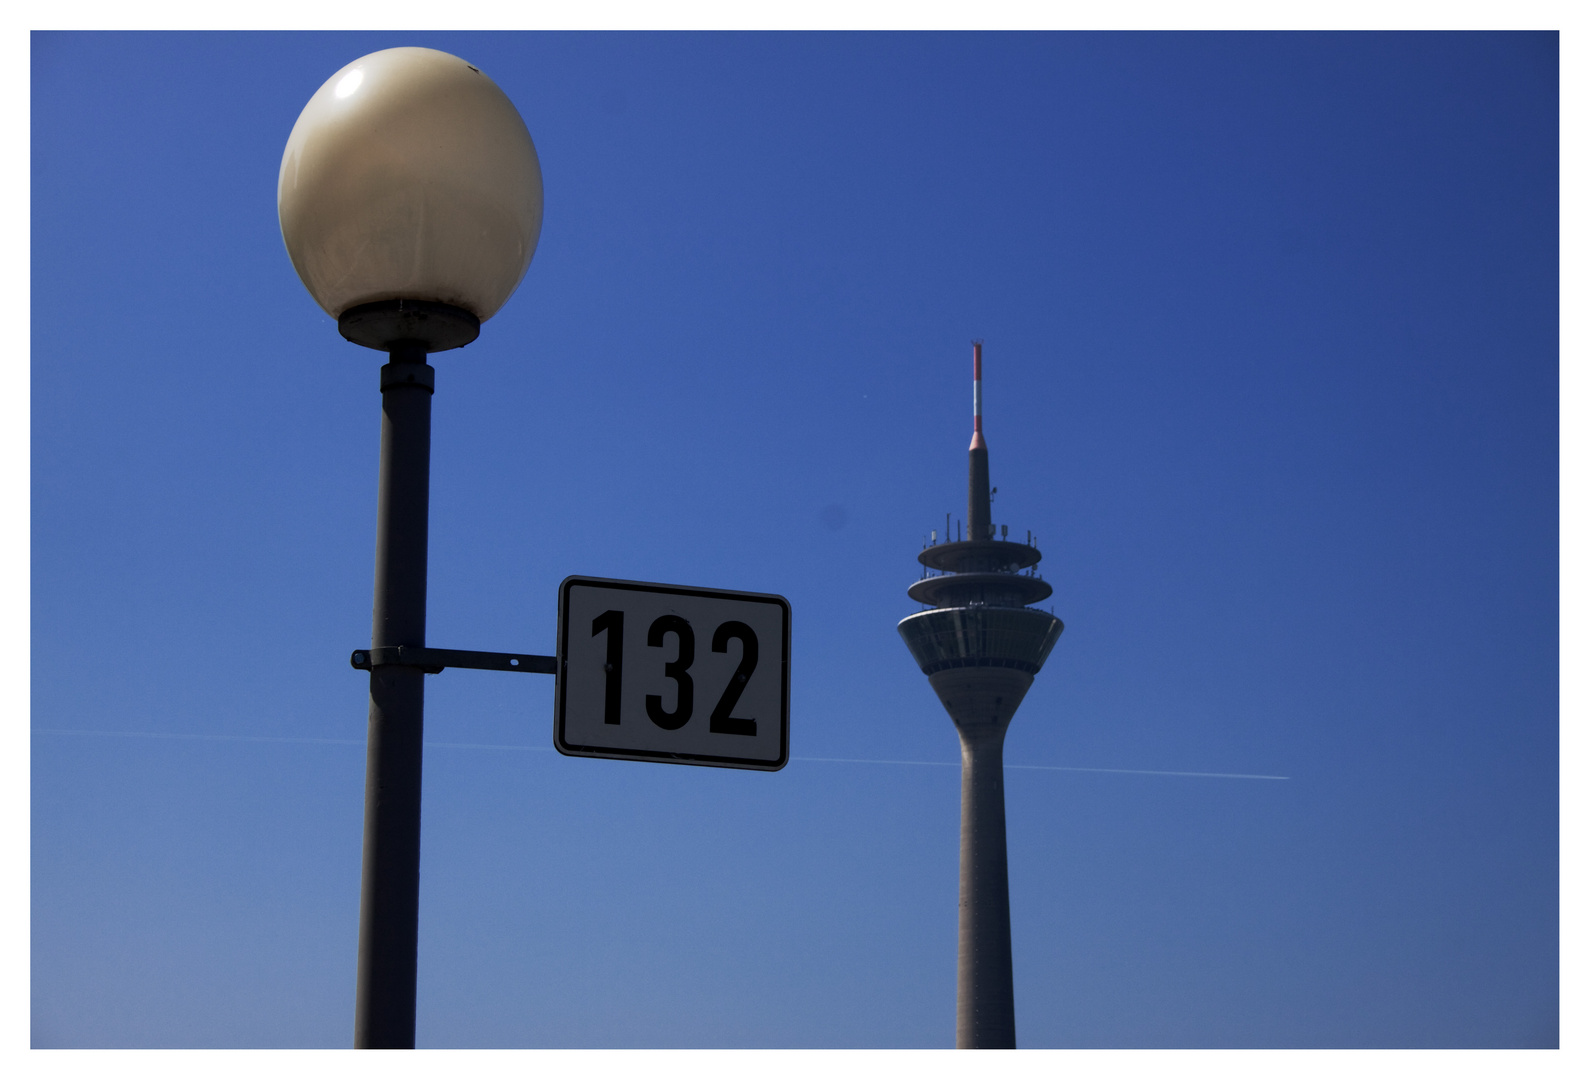 132 Dusseldorf